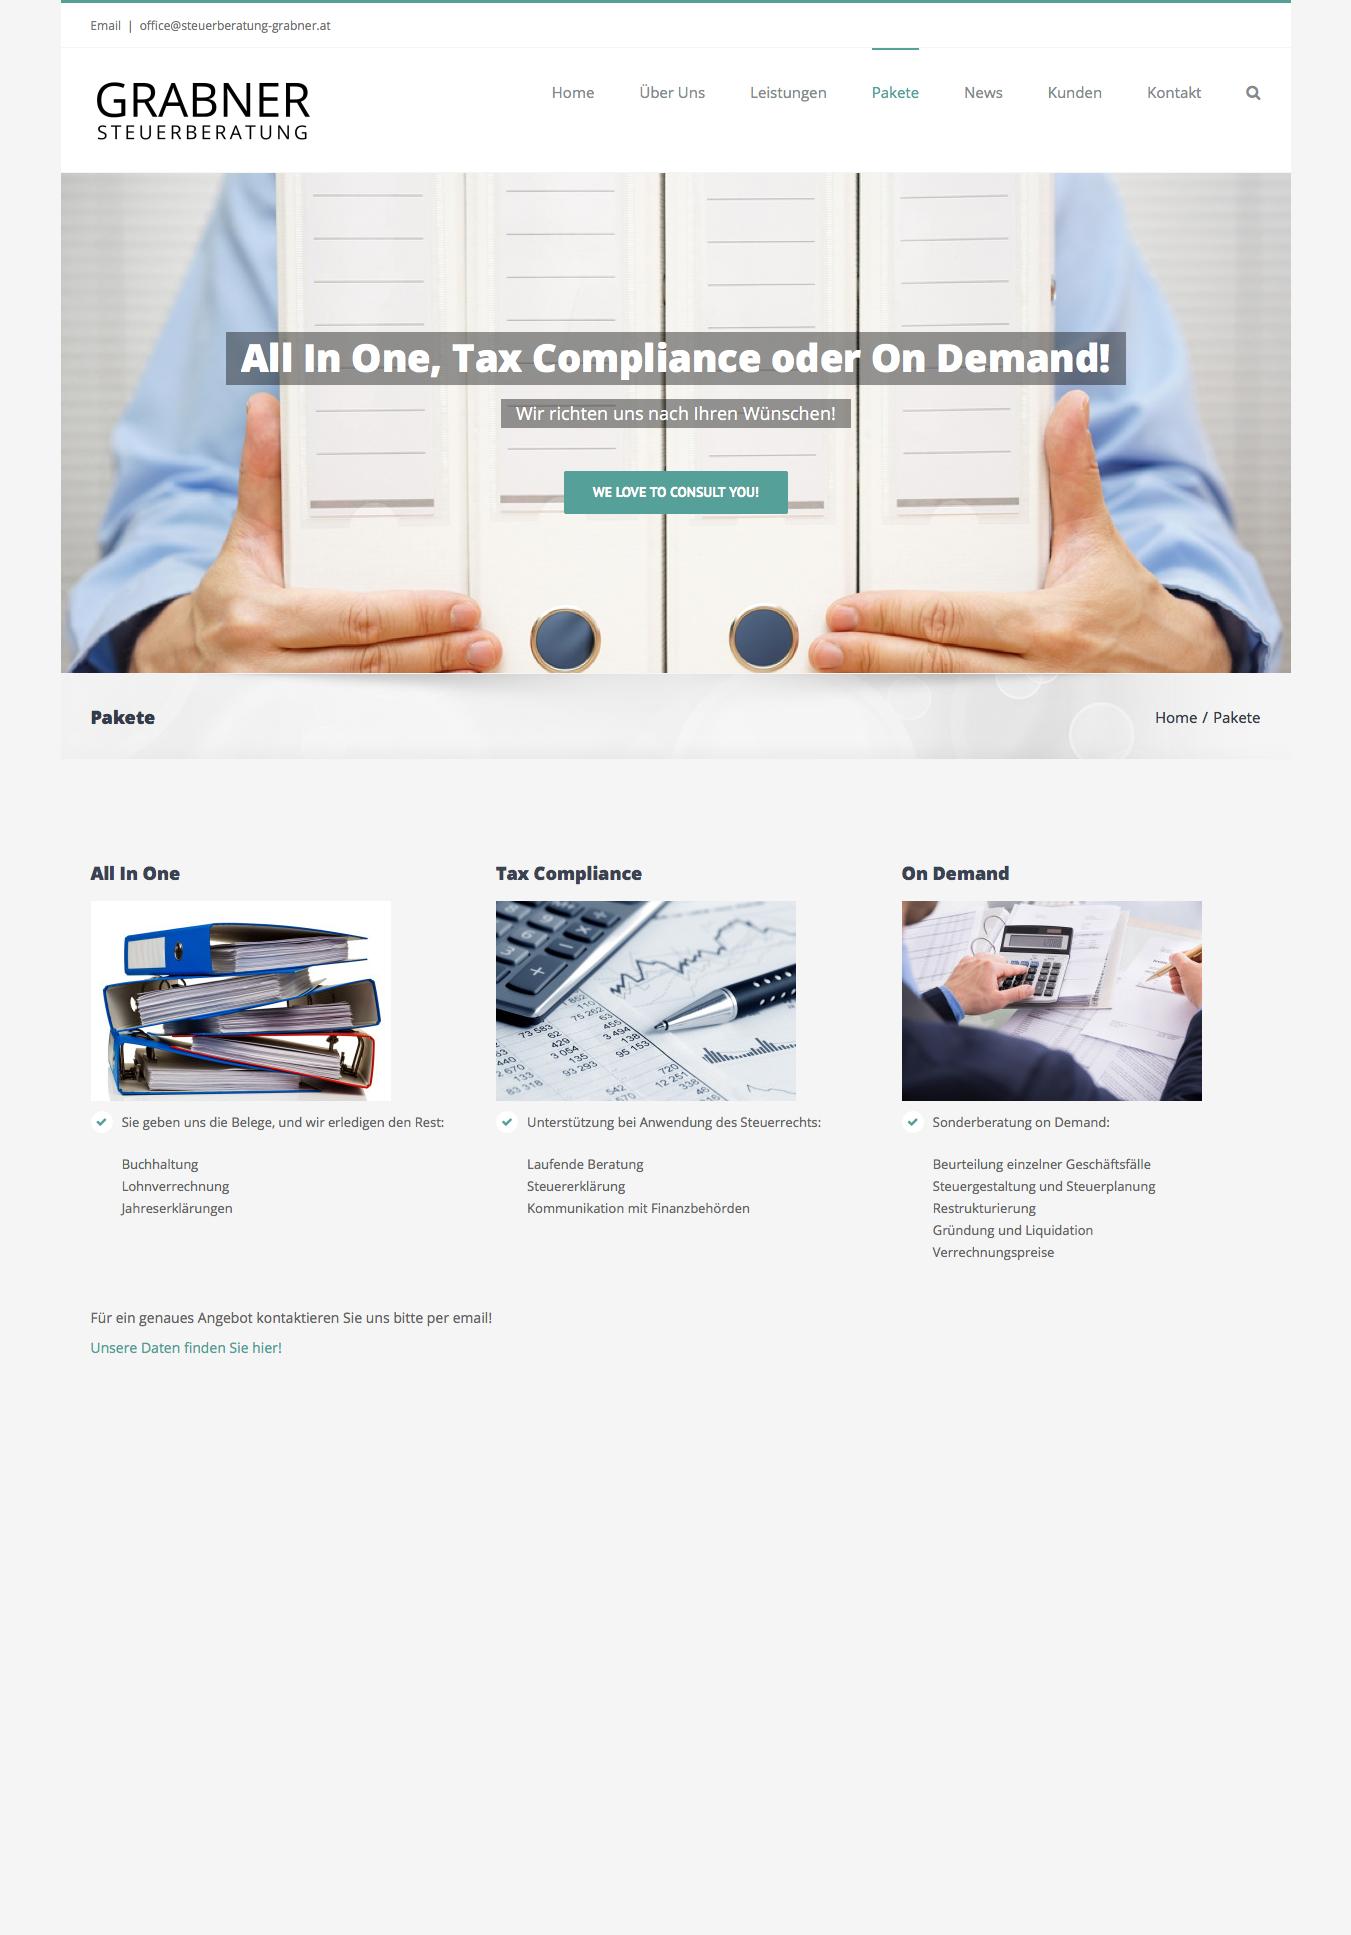 Steuerberatung Grabner by 36 digital&more Website Design